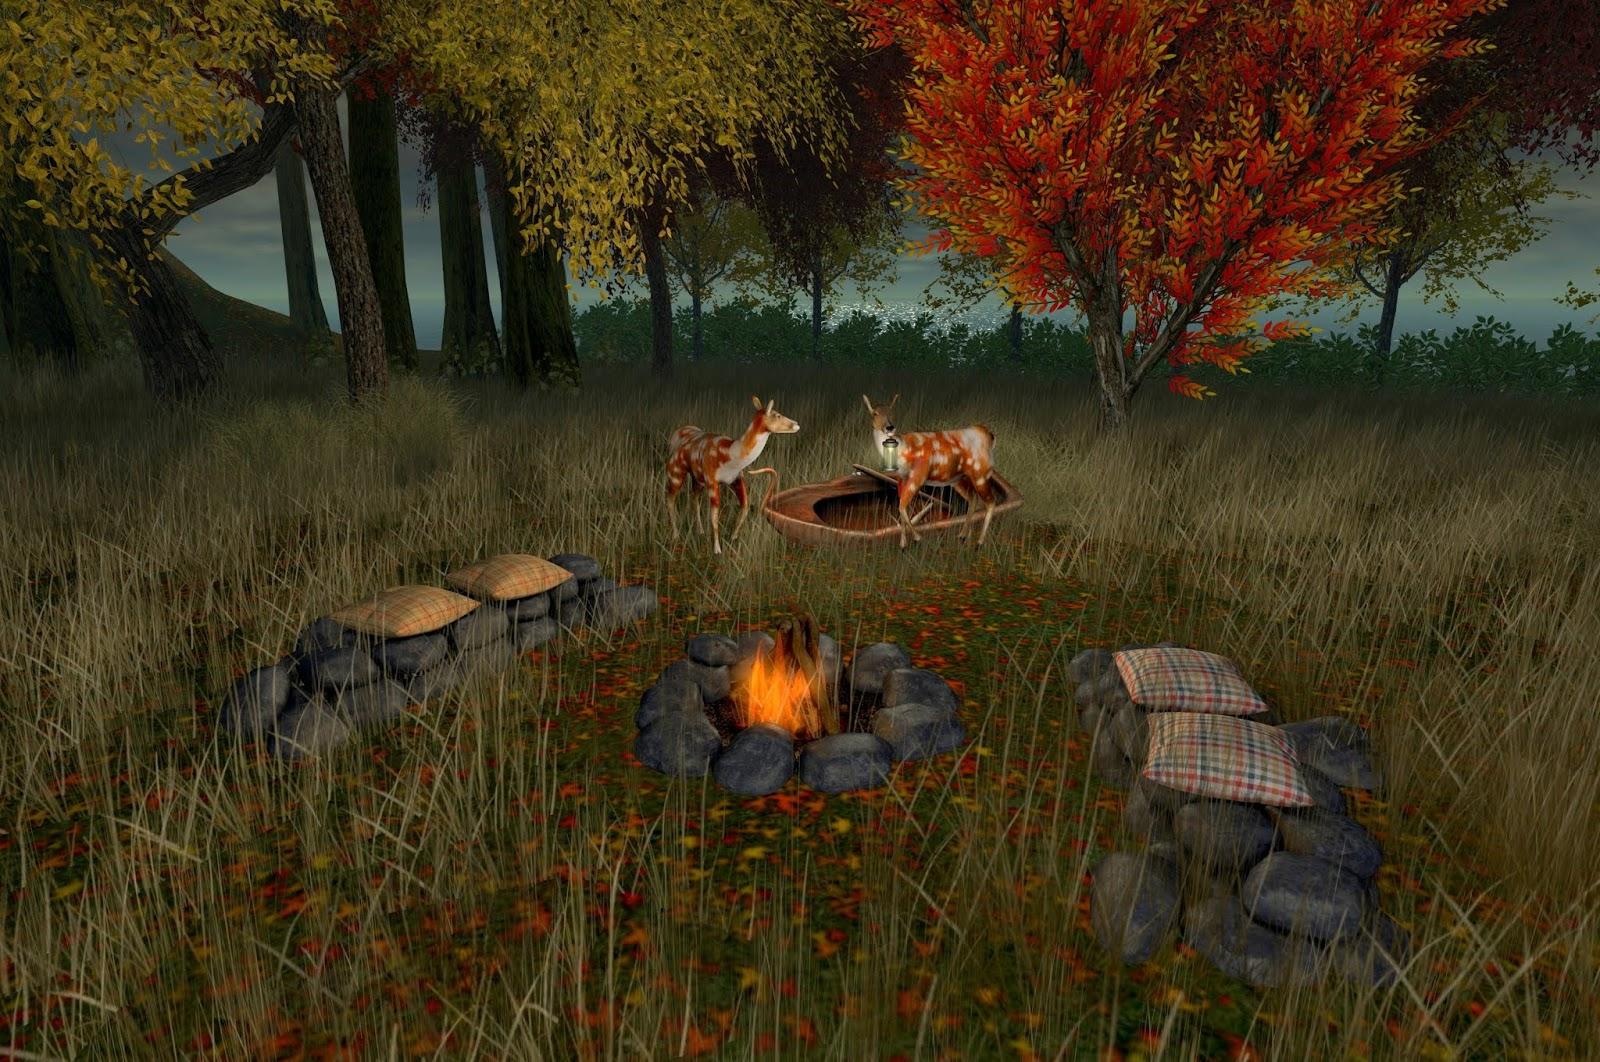 Beware of the Deer